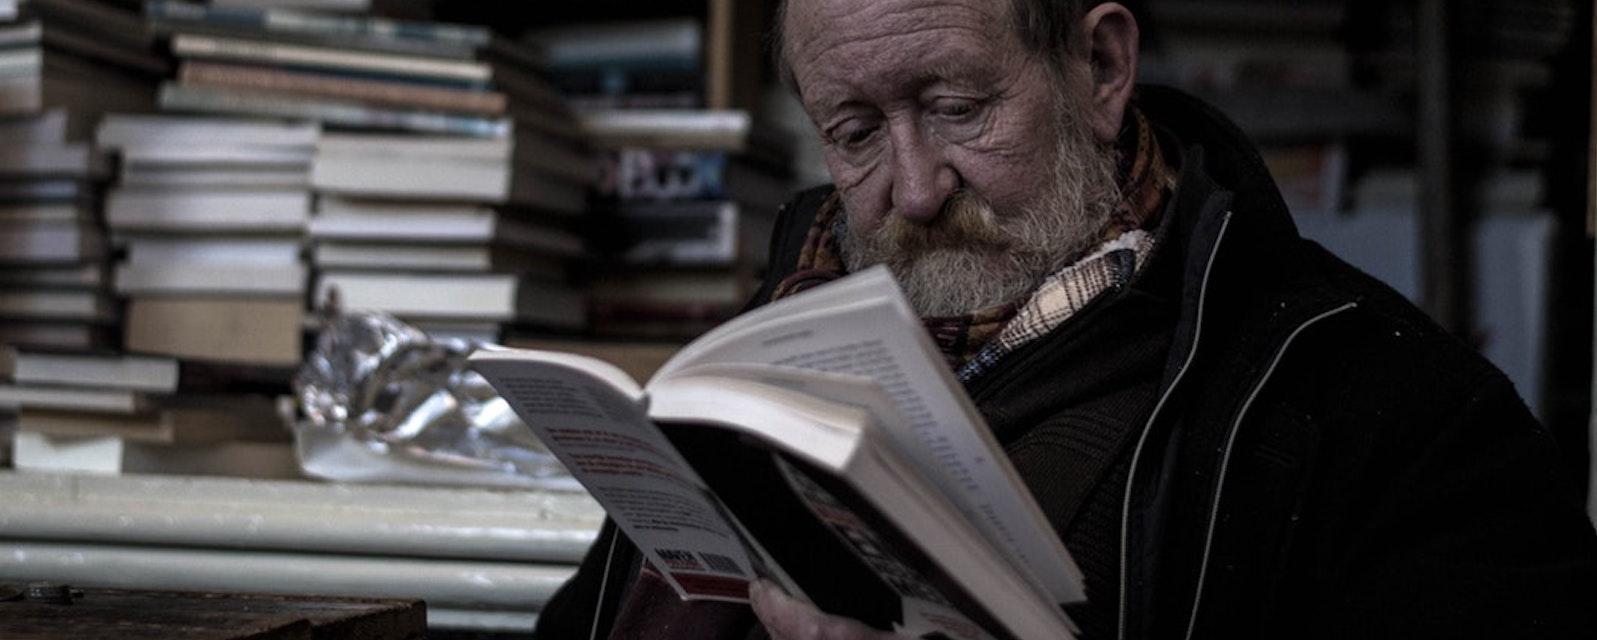 Photo: Jilbert Ebrahimi/unsplash